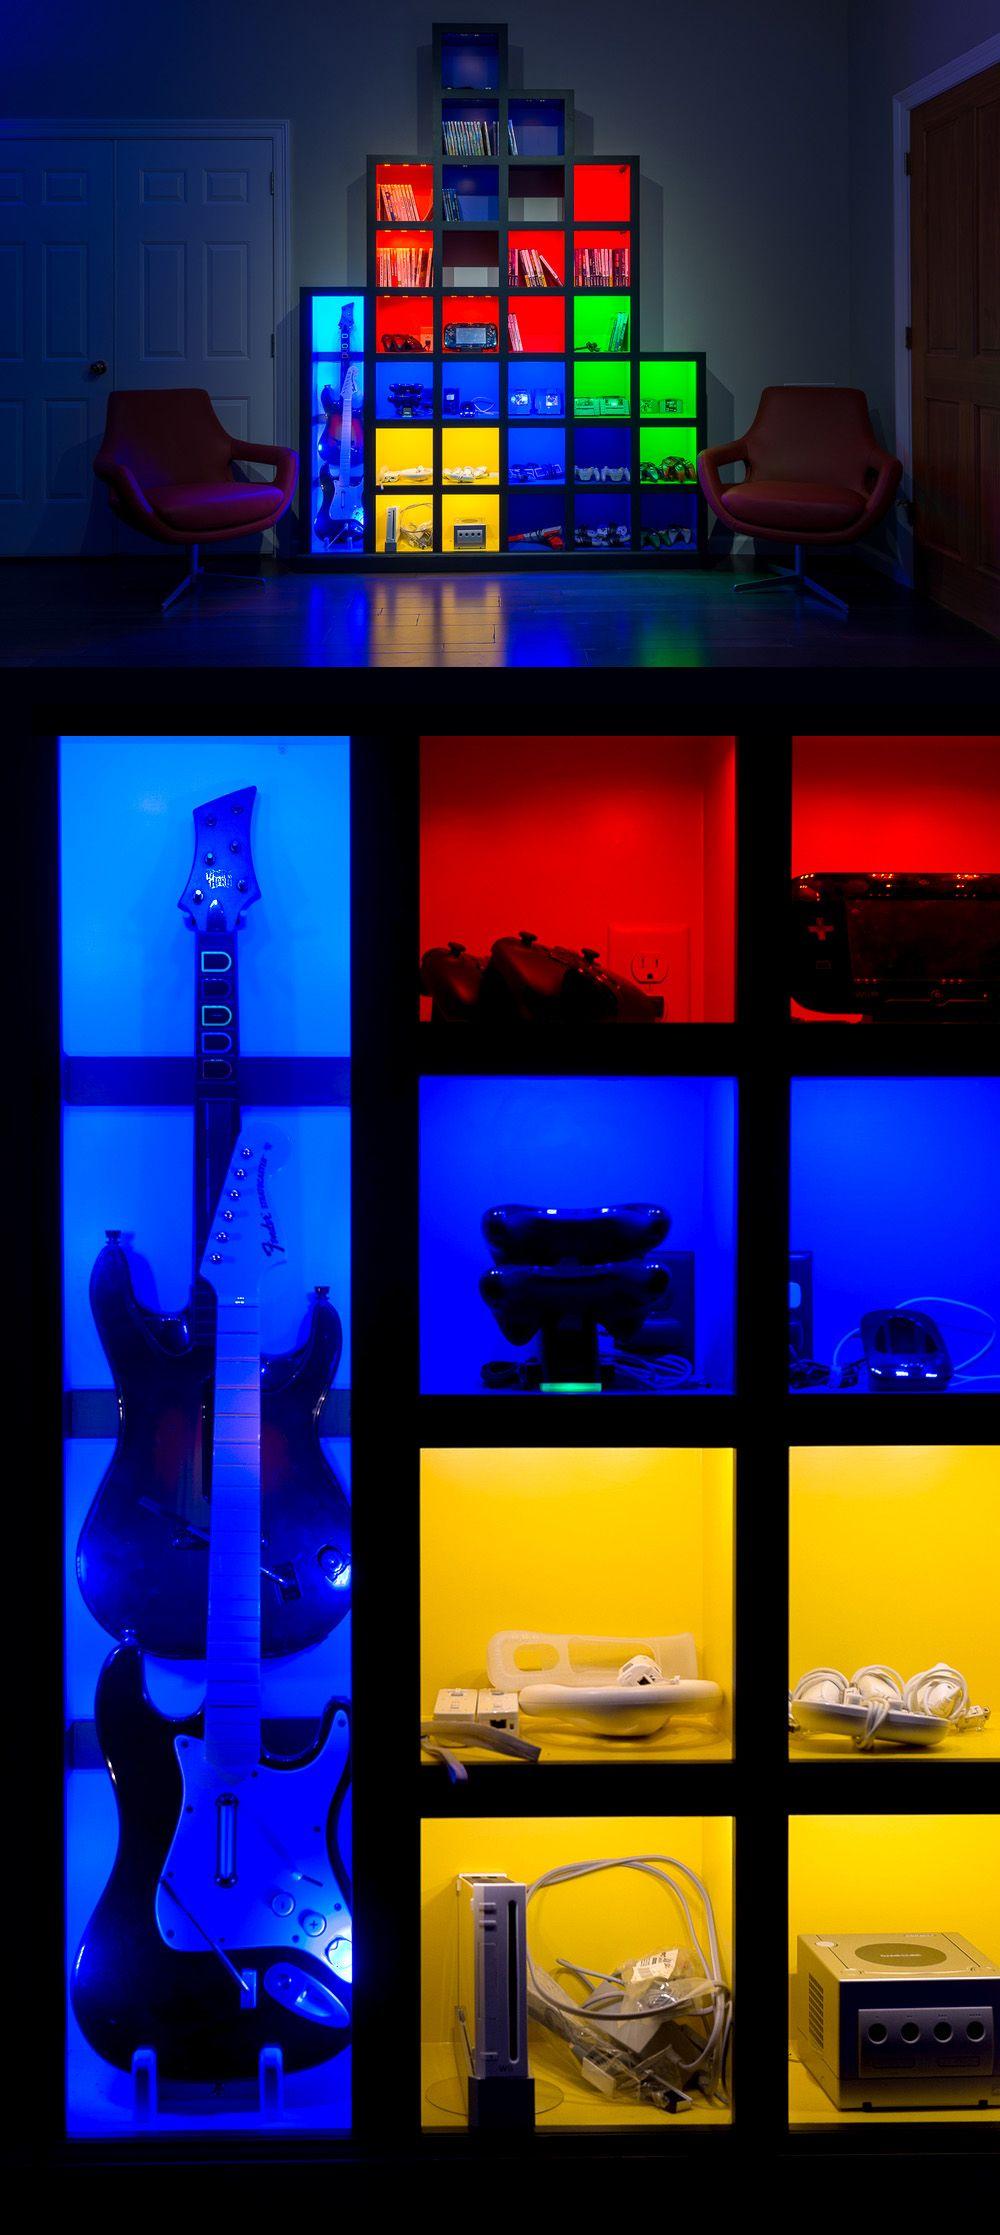 game room lighting ideas. More Ideas Below: Teenage Gamer Room Organization Girly Games Lights Seating Decor Minimalist Game Lighting G